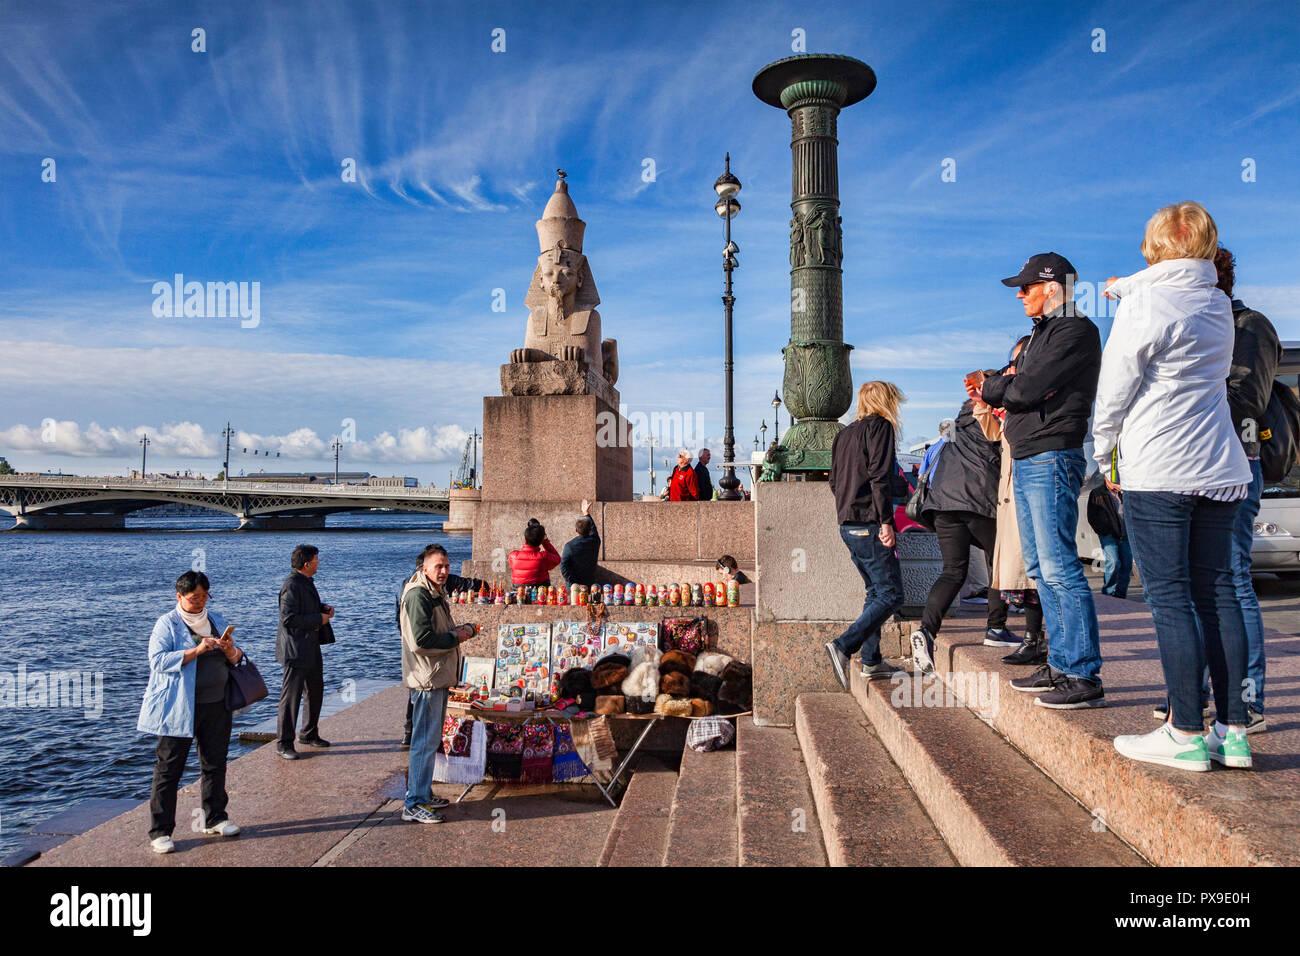 st petersburg russia tourism